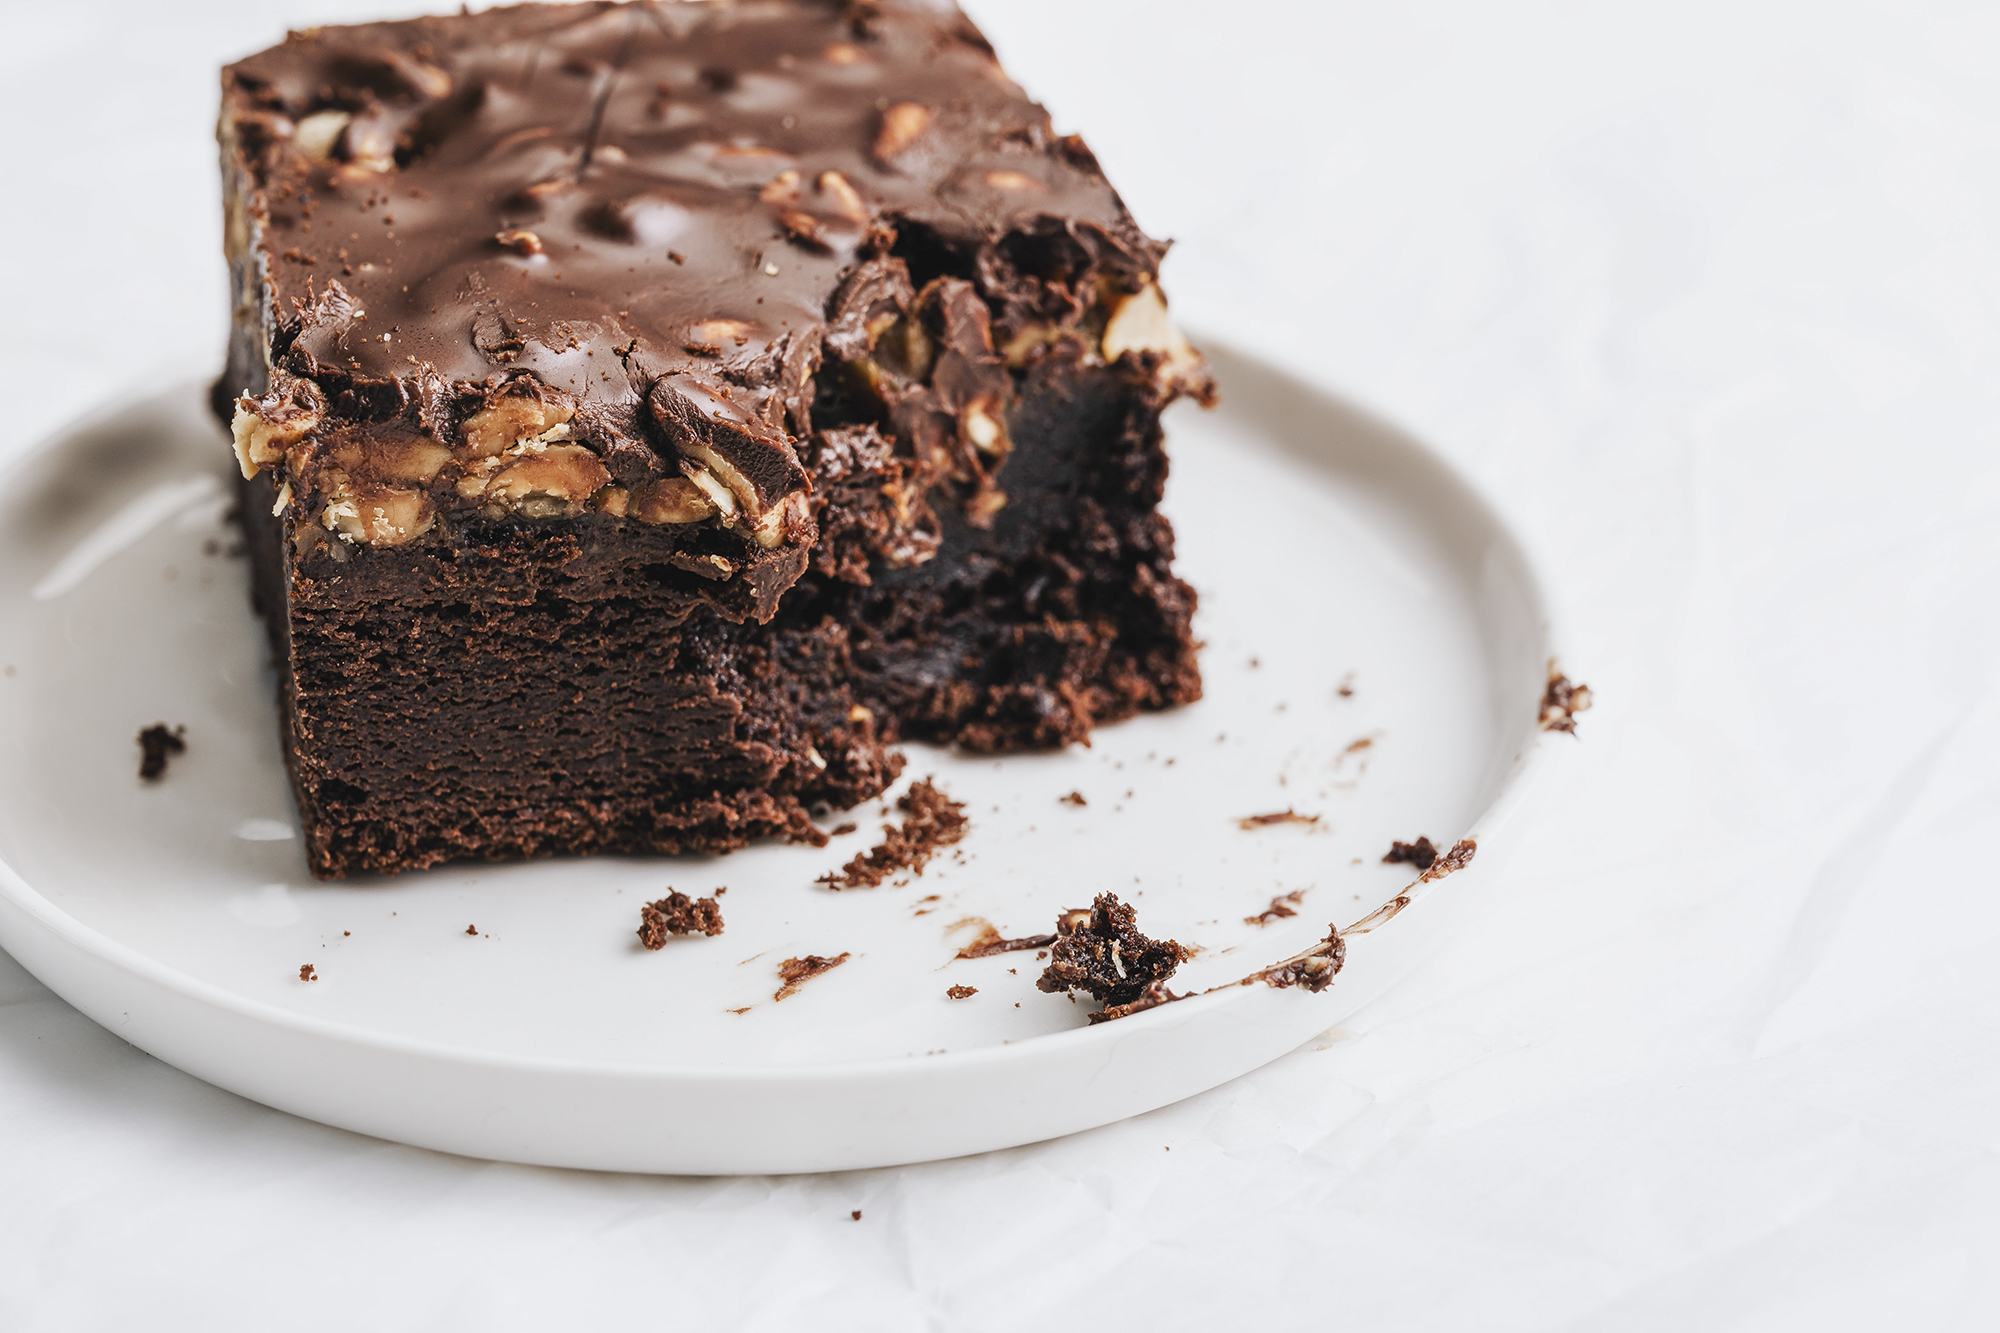 Çikolata ve Special Kek Yapım Teknikleri